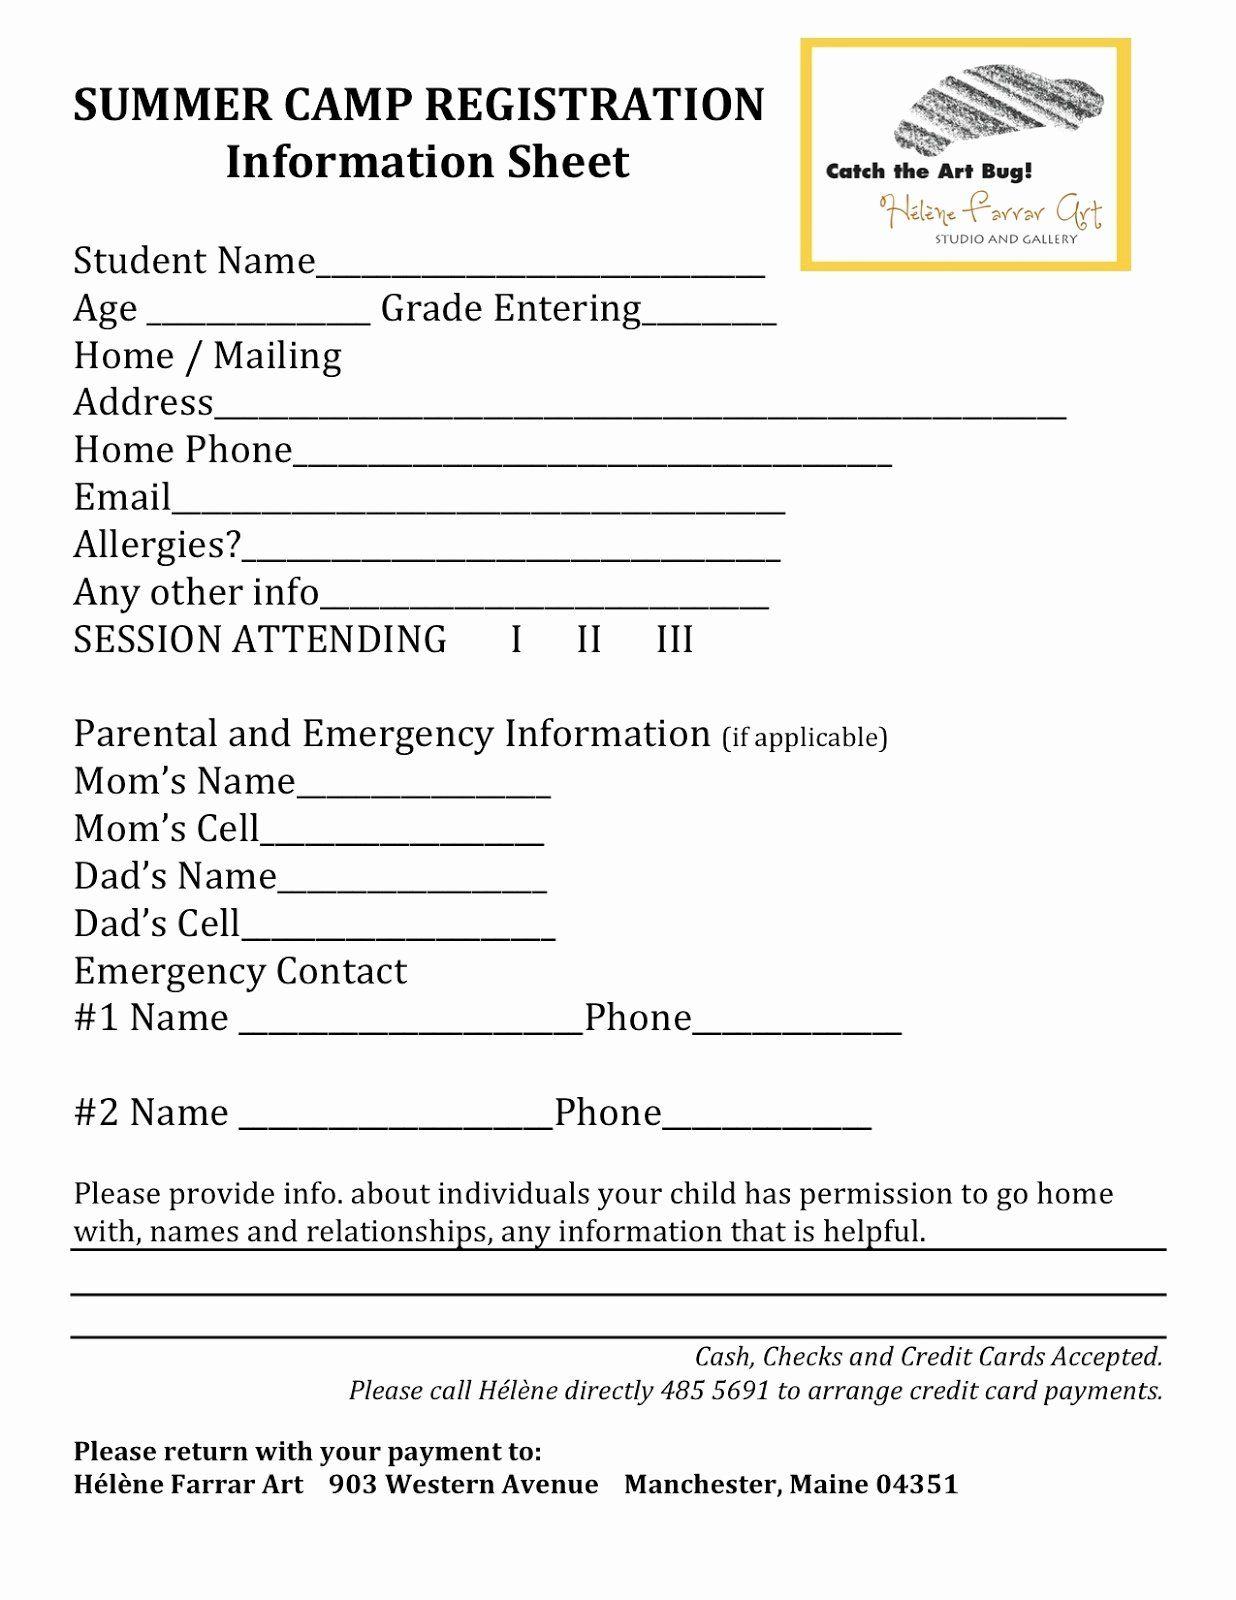 Camp Registration Form Template Word Lovely Registration Form Template Registration Form Registration Summer Camp Summer camp registration form sample